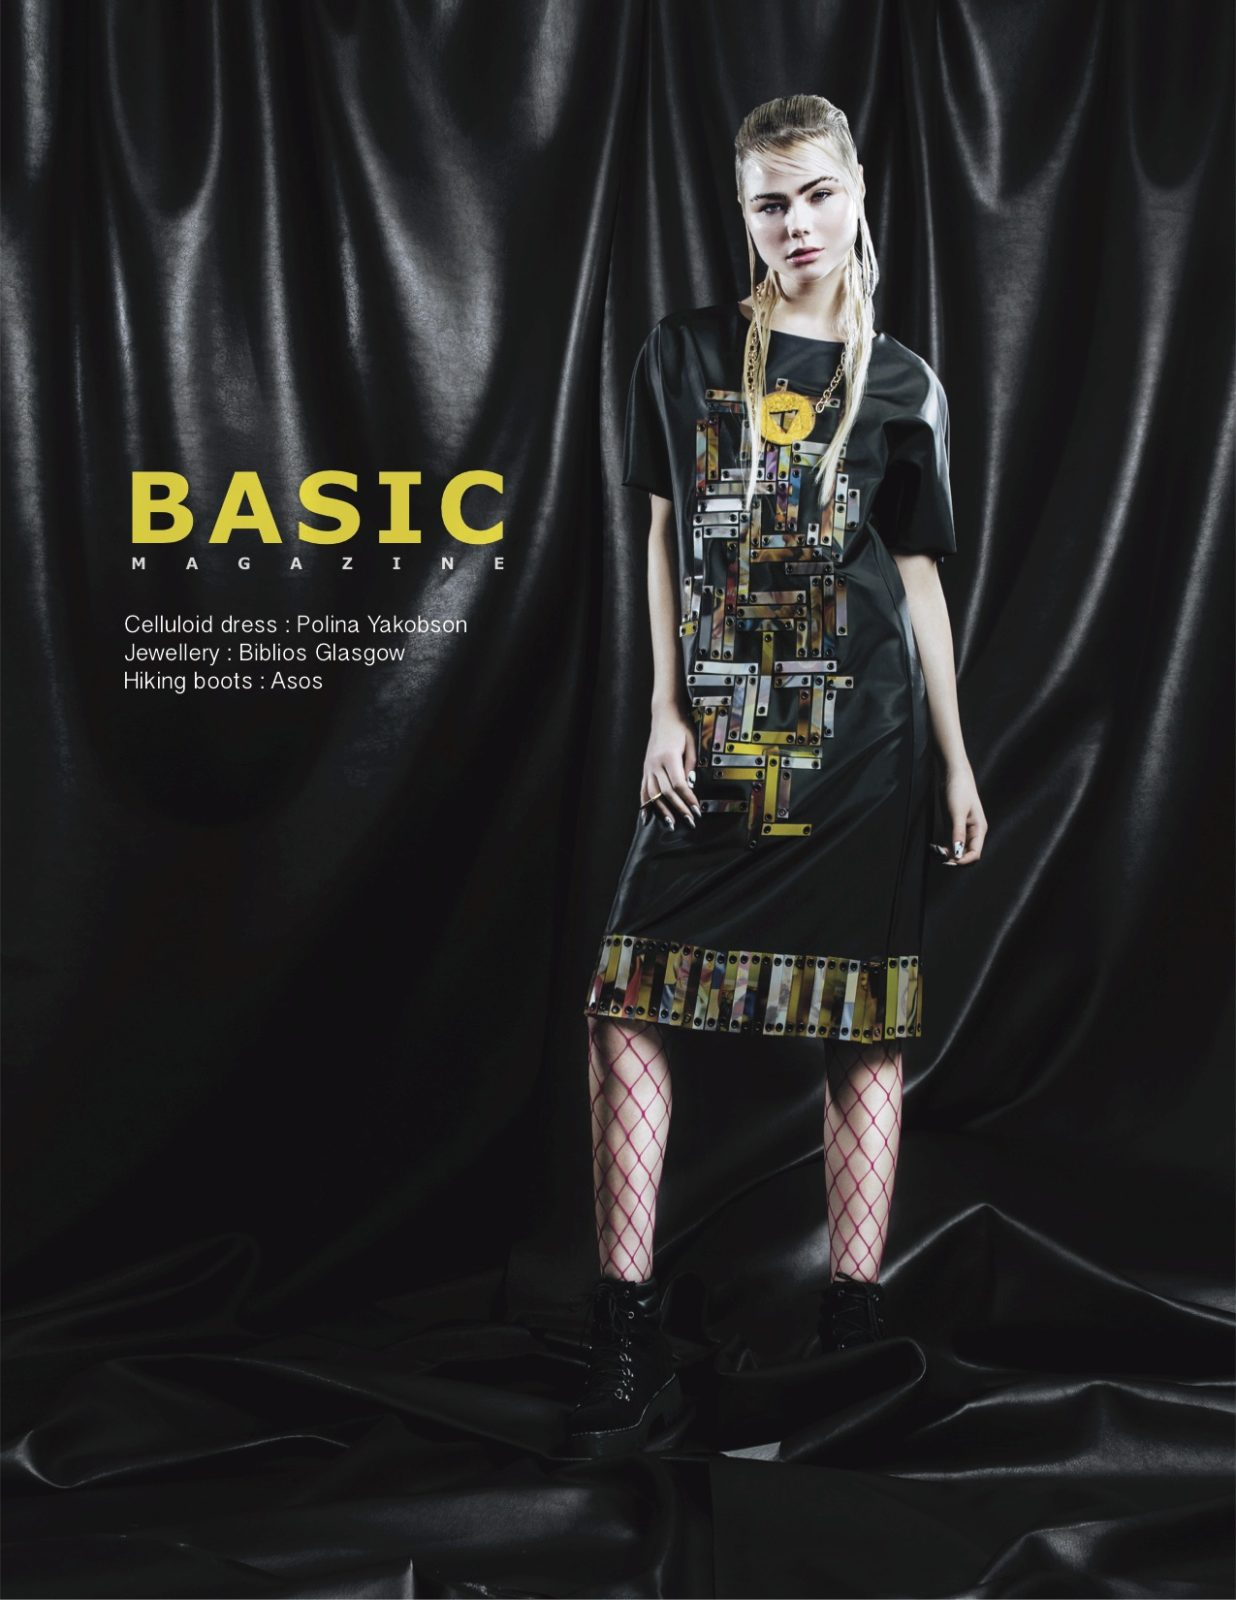 basic-magazine_marina-dean-francis_07